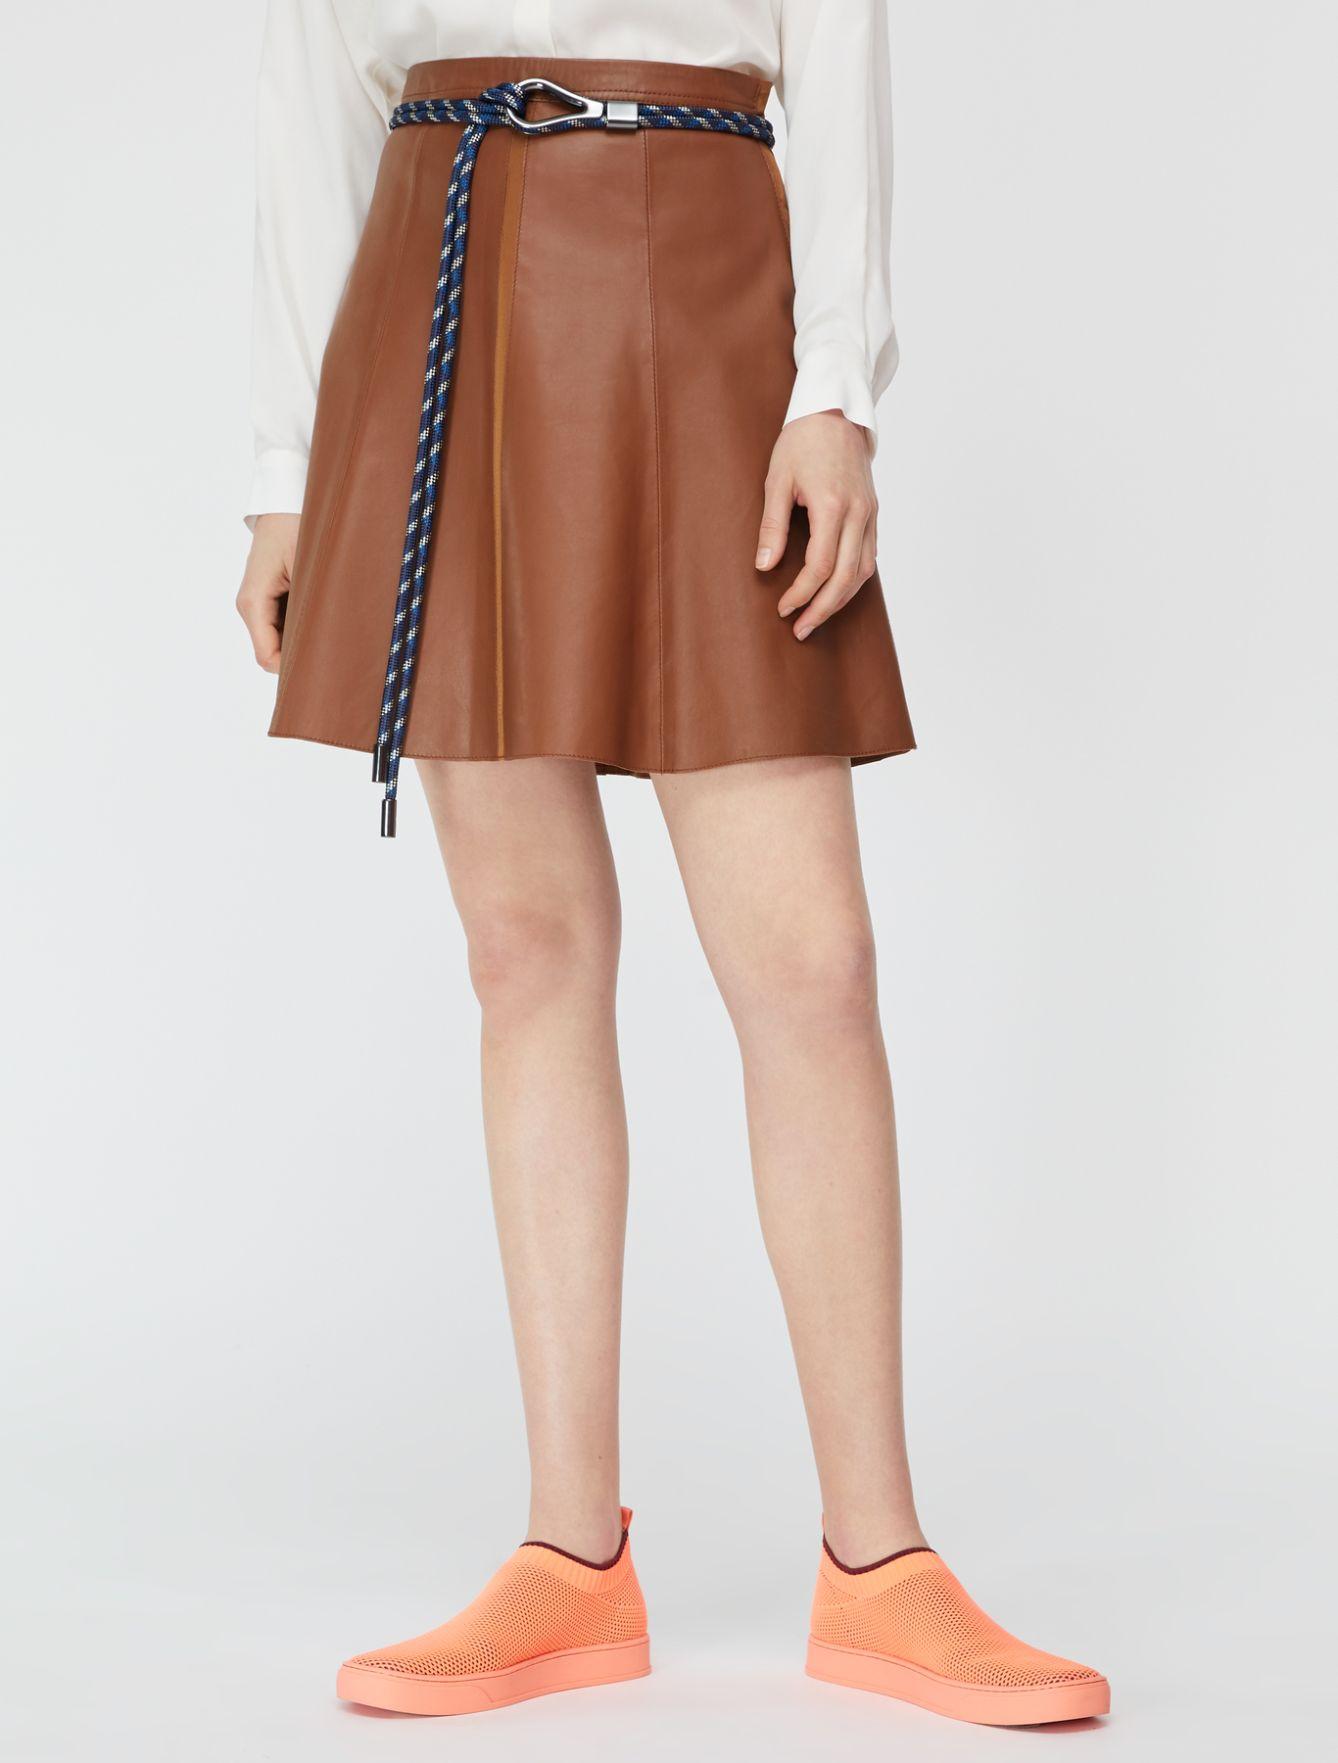 DELEGATO Leather Skirt brown 1